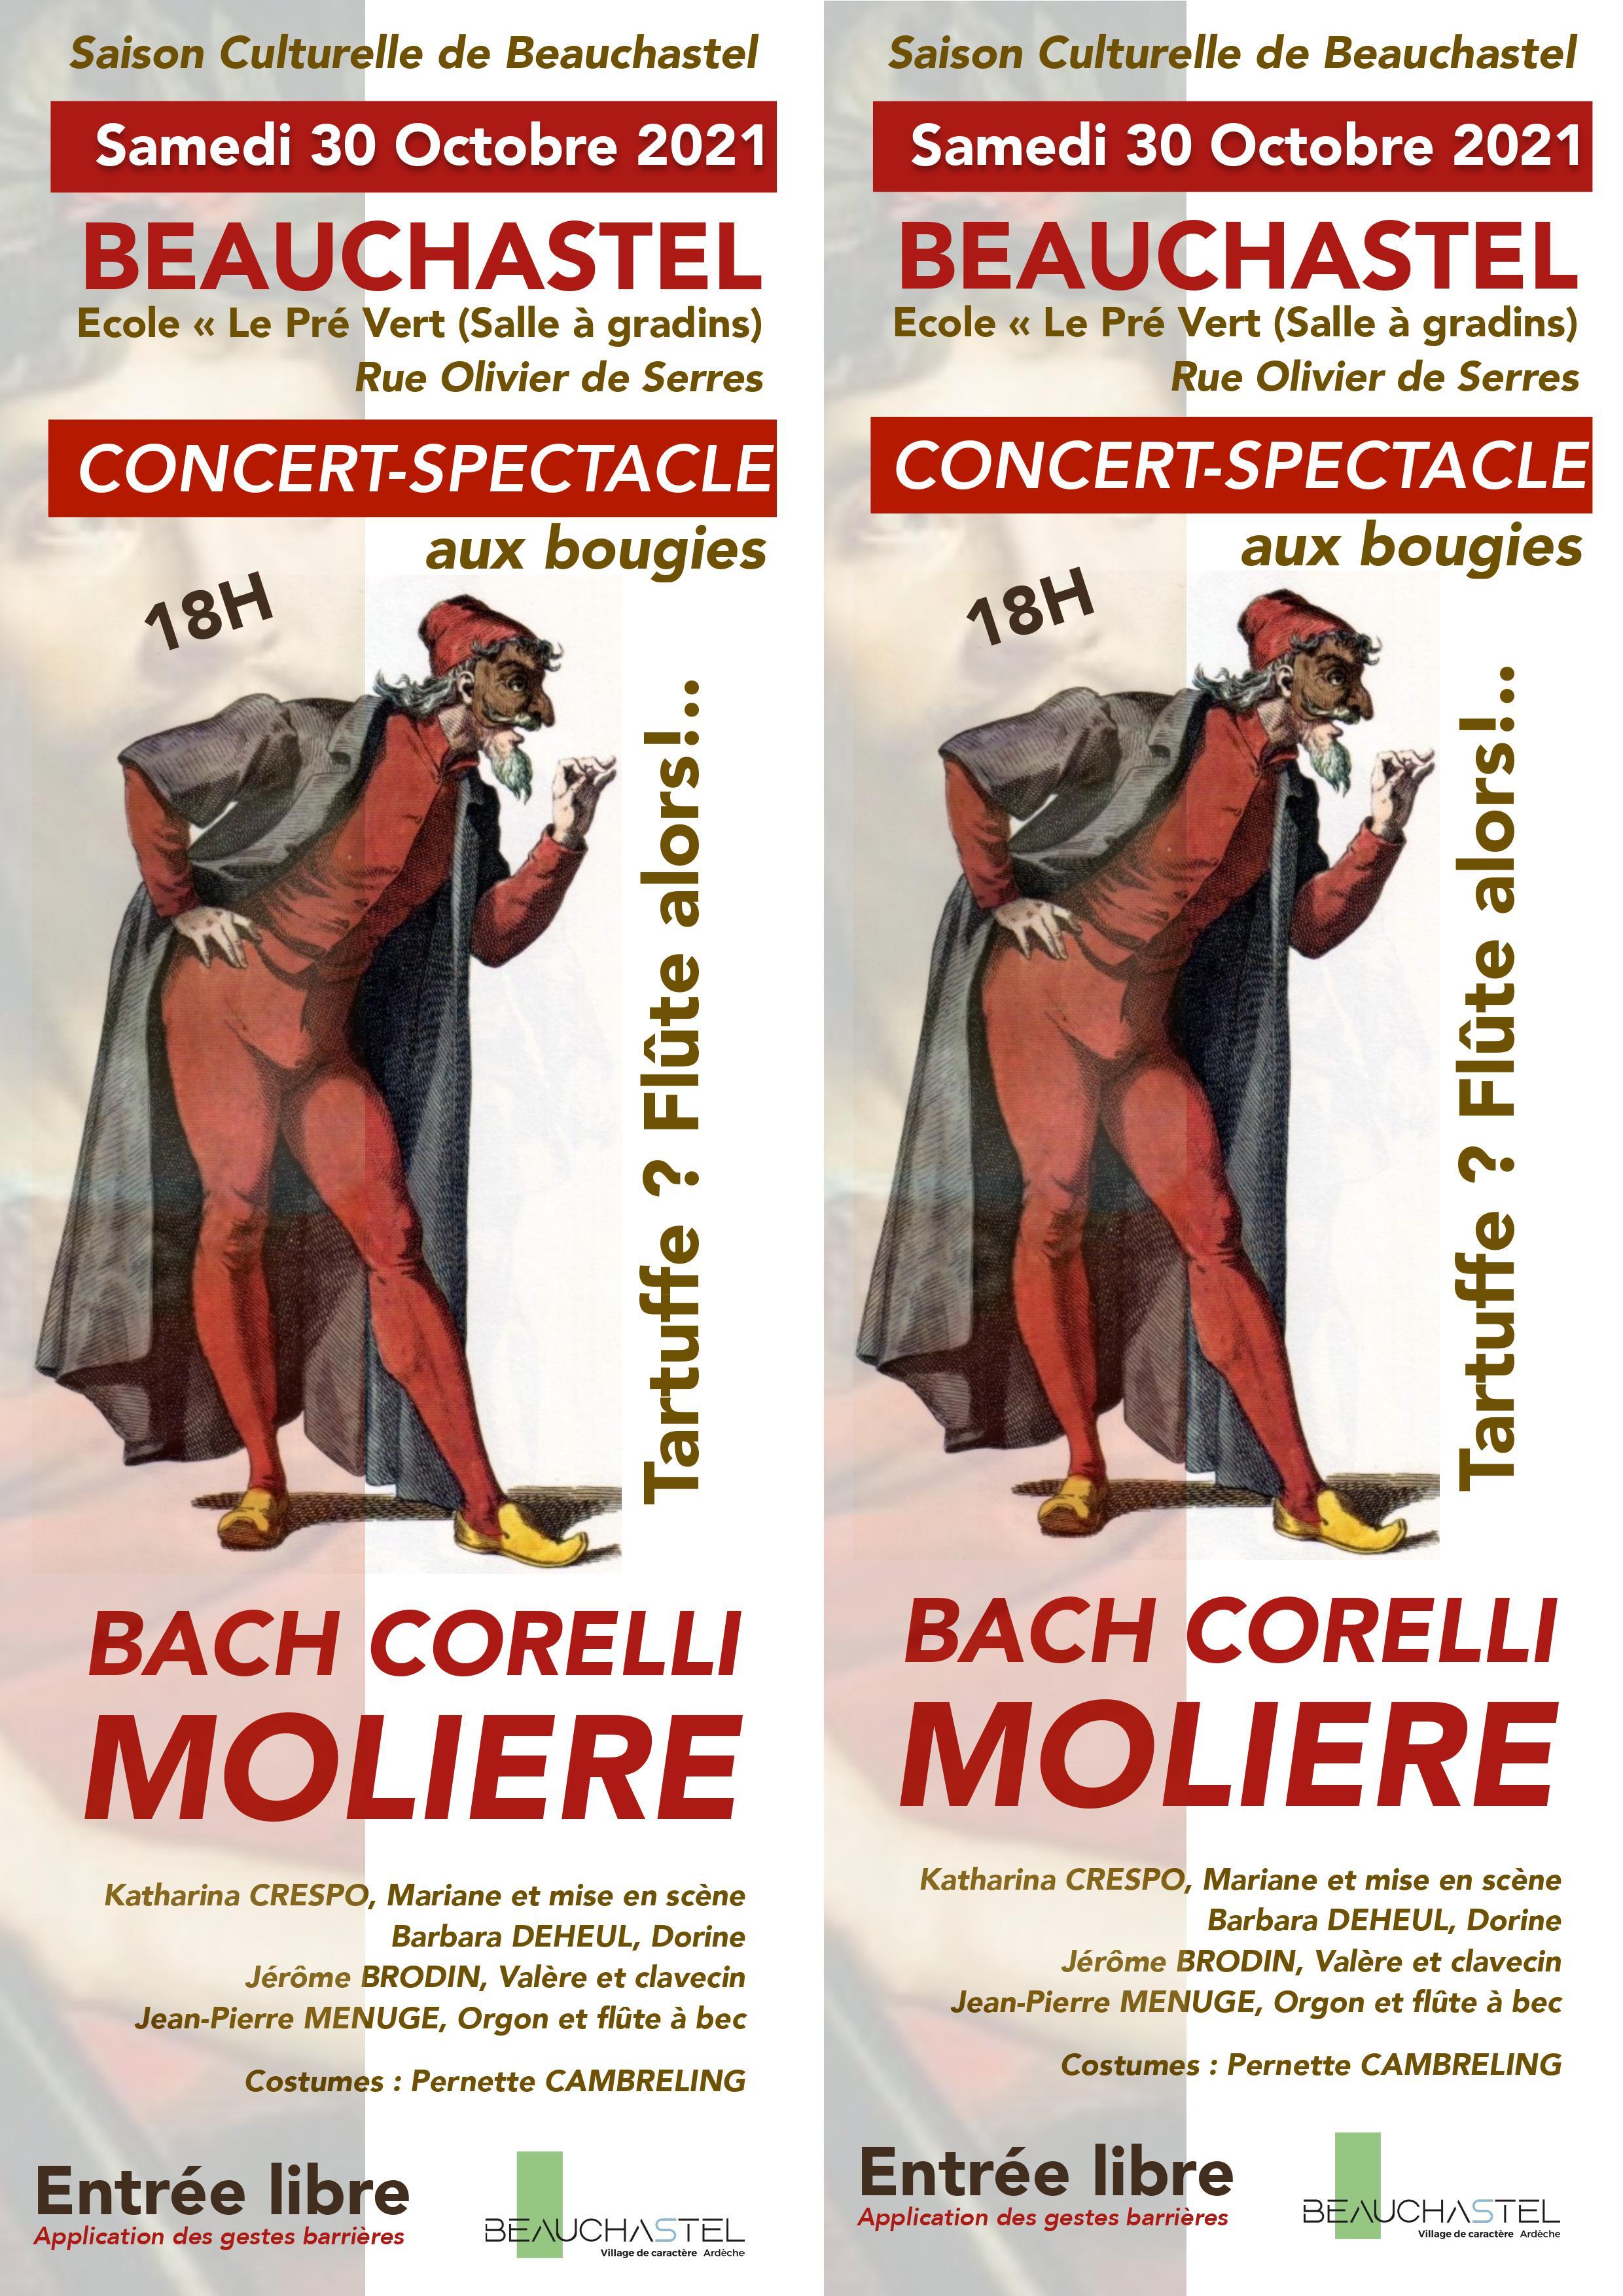 Alle leuke evenementen! : Concert-spectacle aux bougies : Tartuffe ? Flûte alors !...